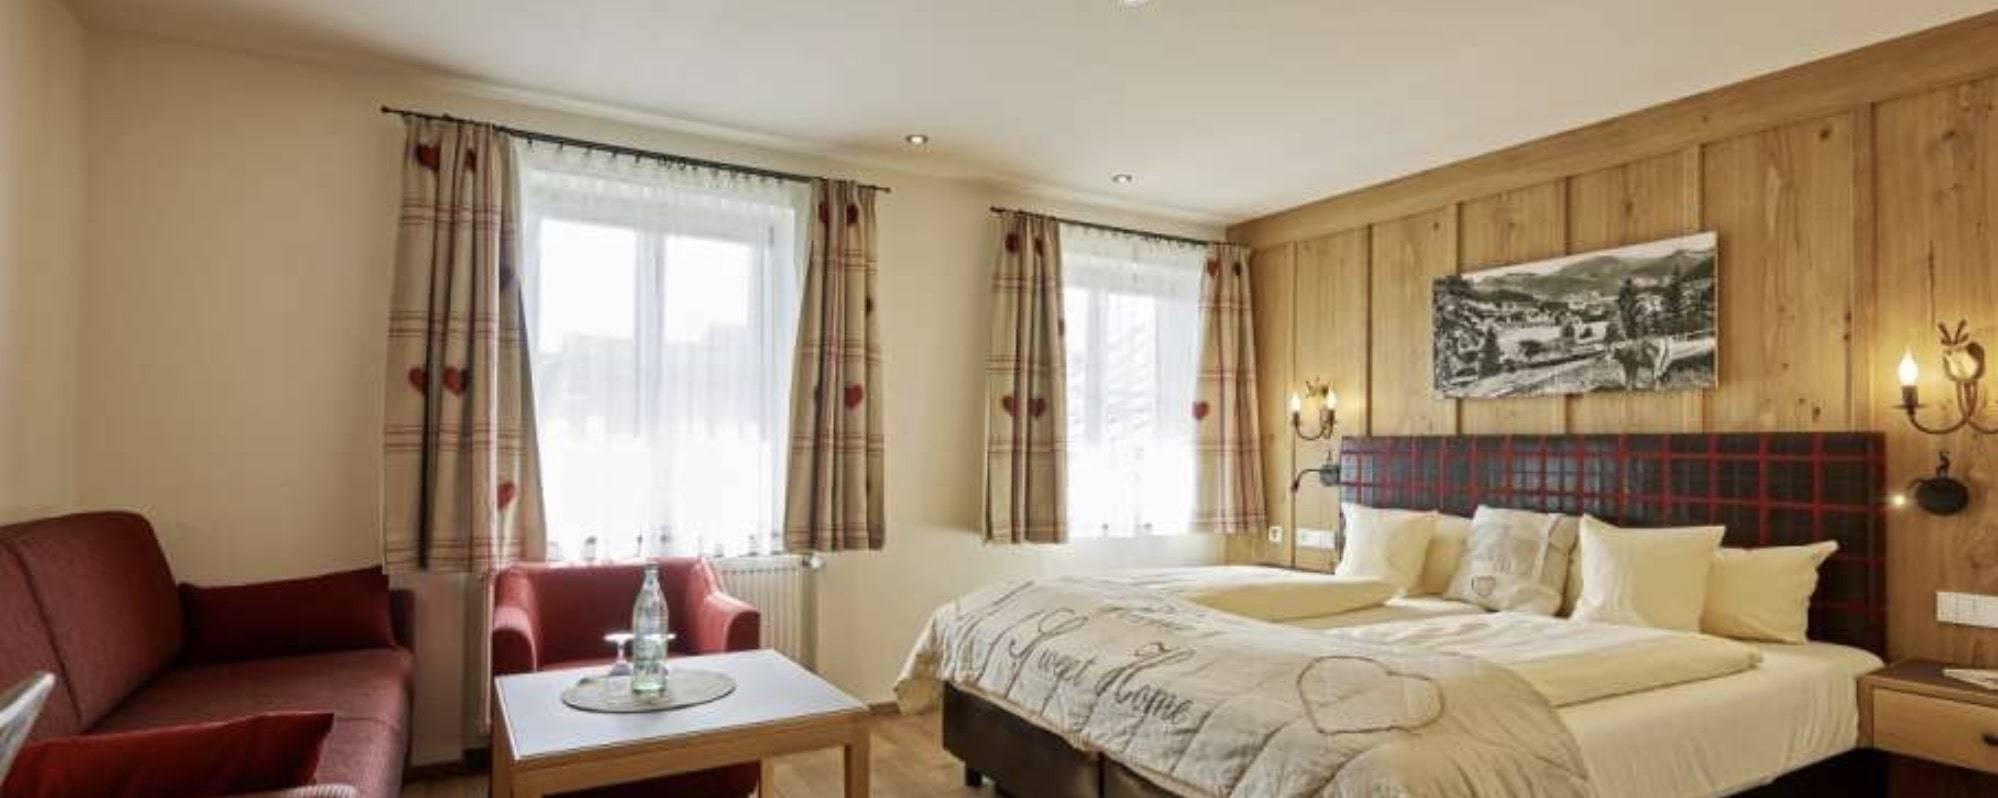 Hotel Adler Partnerprogramm Zimmer